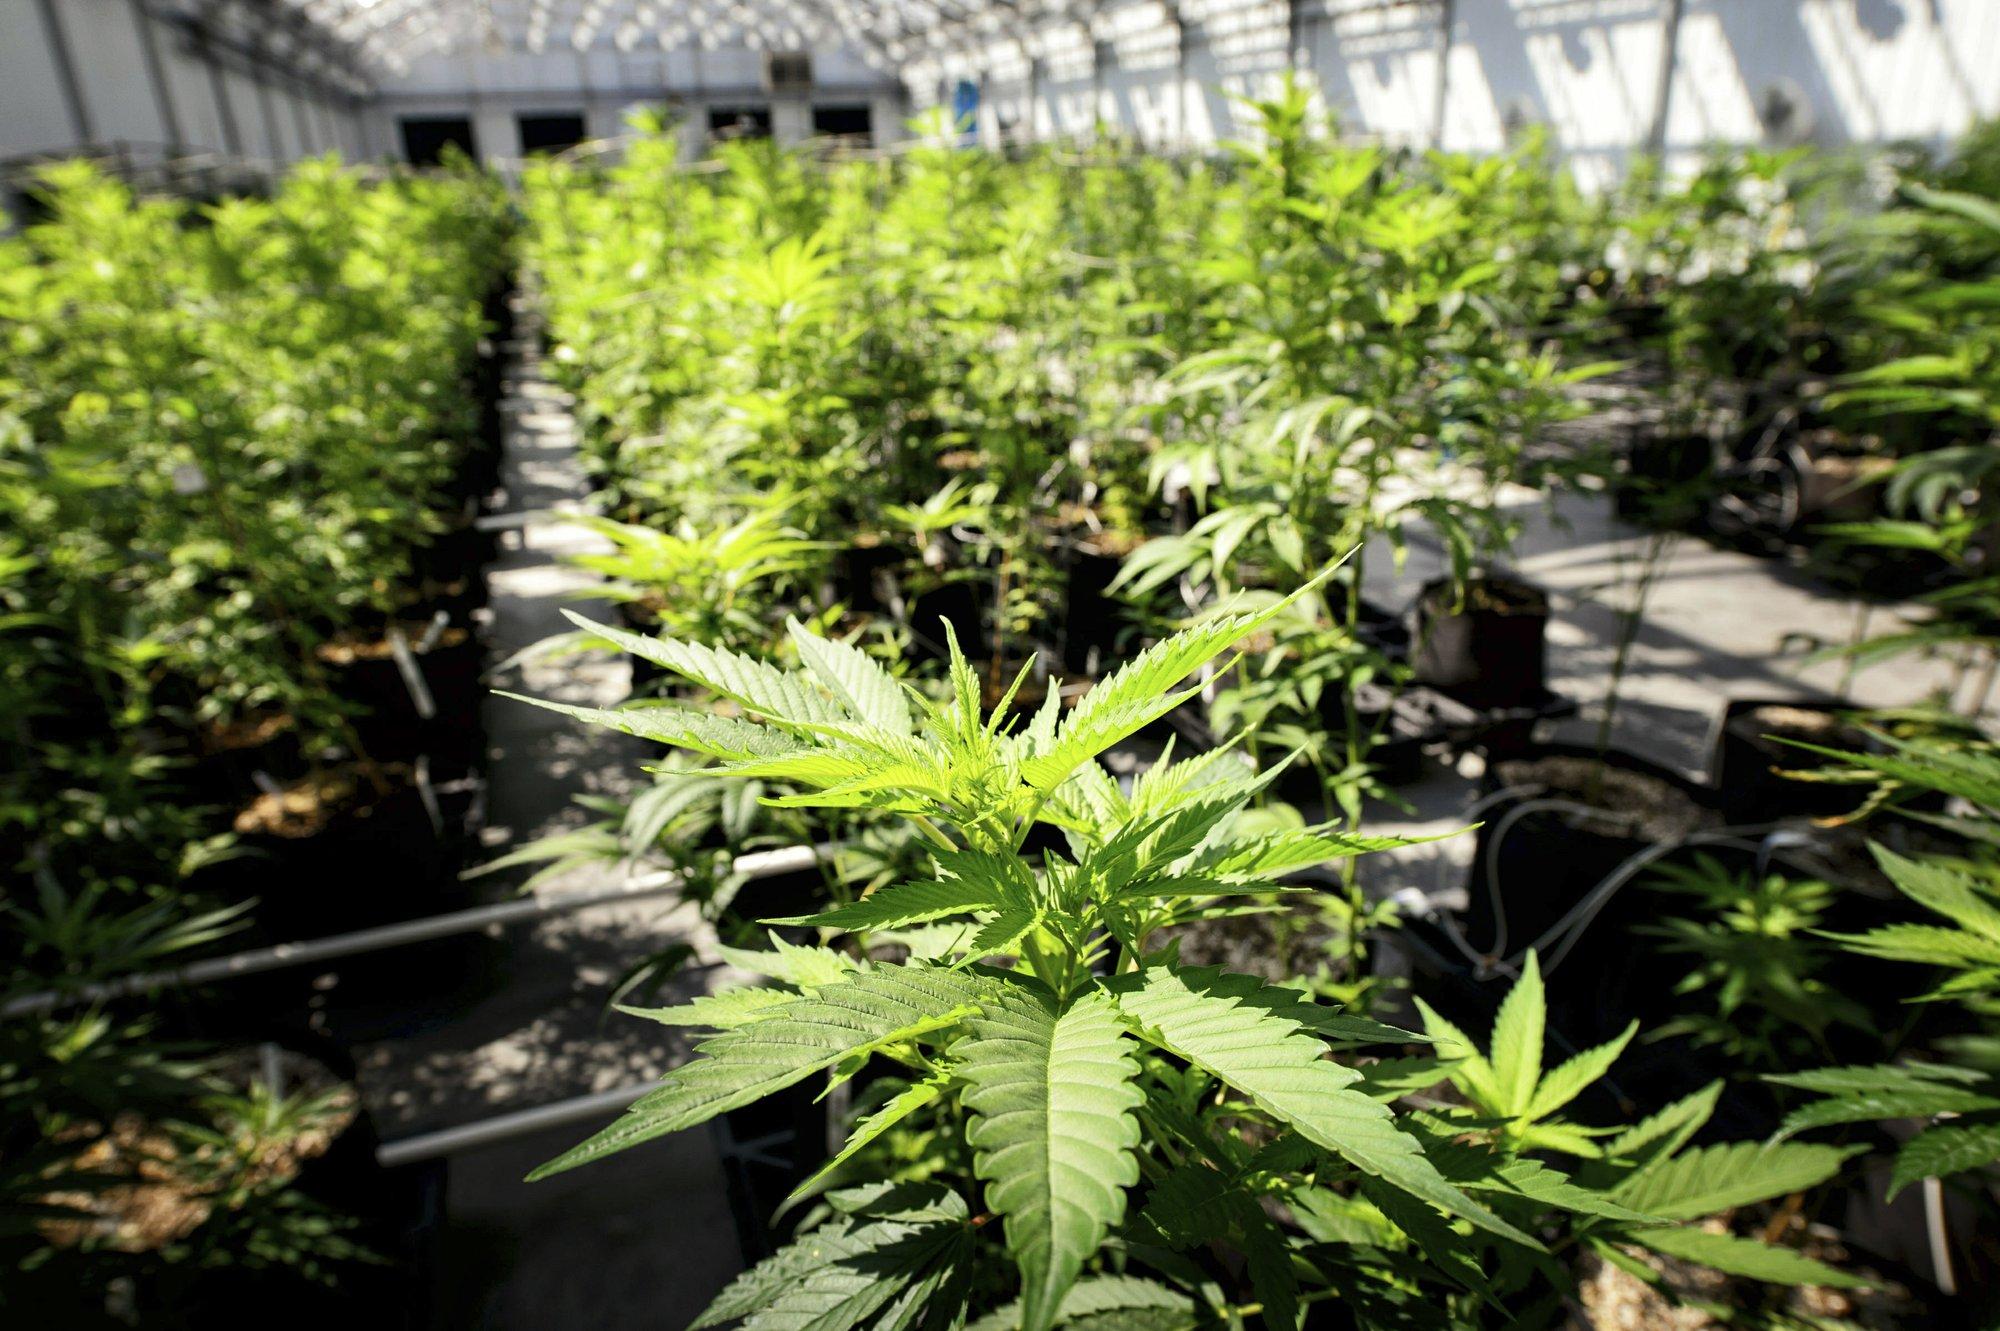 Pot 'legalization 2.0': Social equity becomes a key question